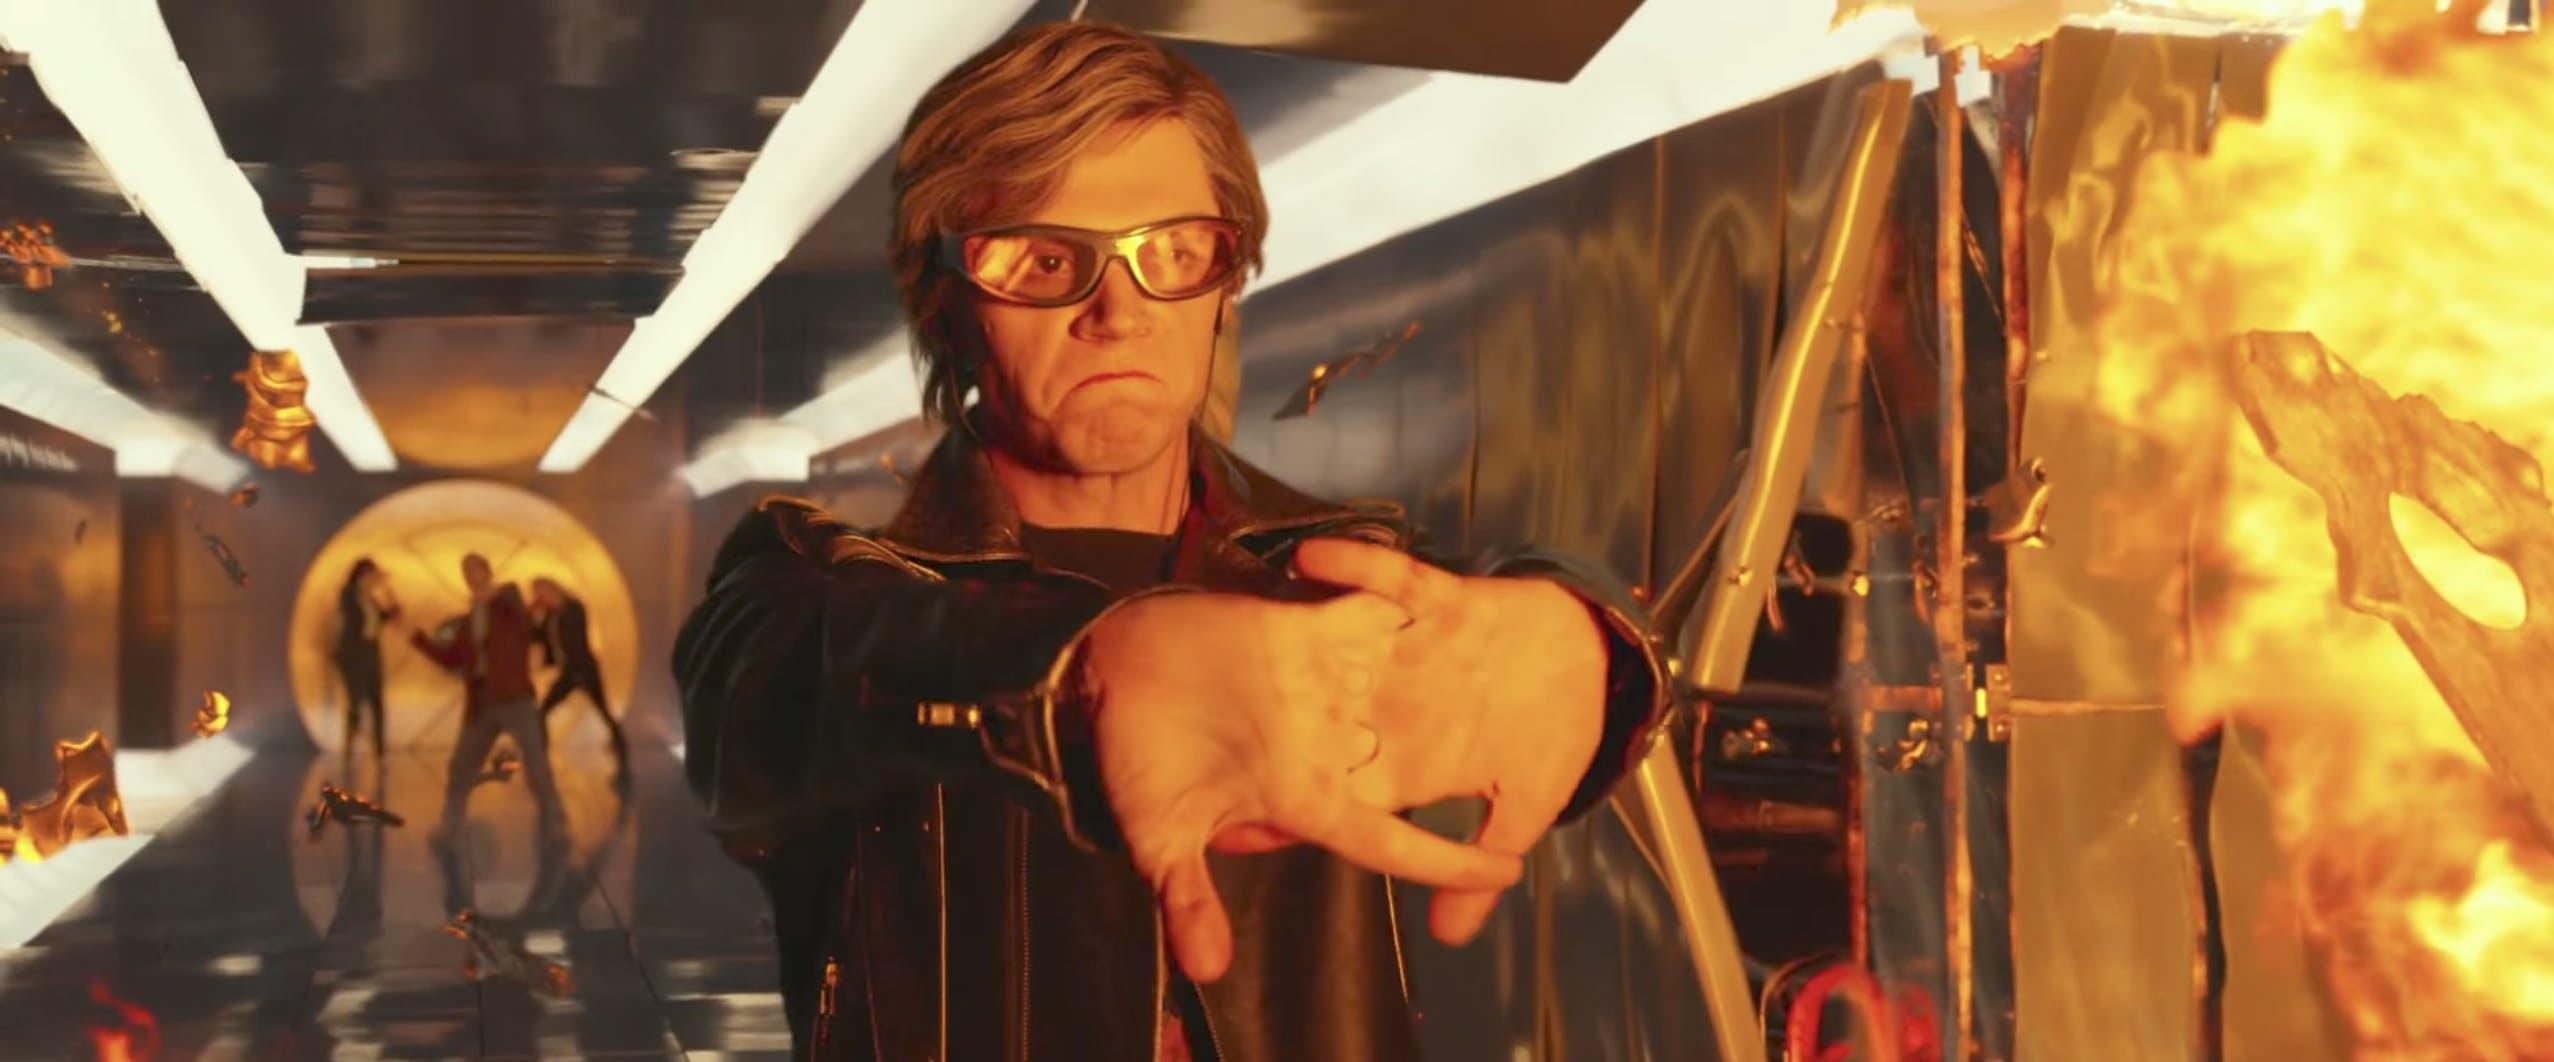 x-men movies in order : Quicksilver in 'X-Men: Apocalypse.'